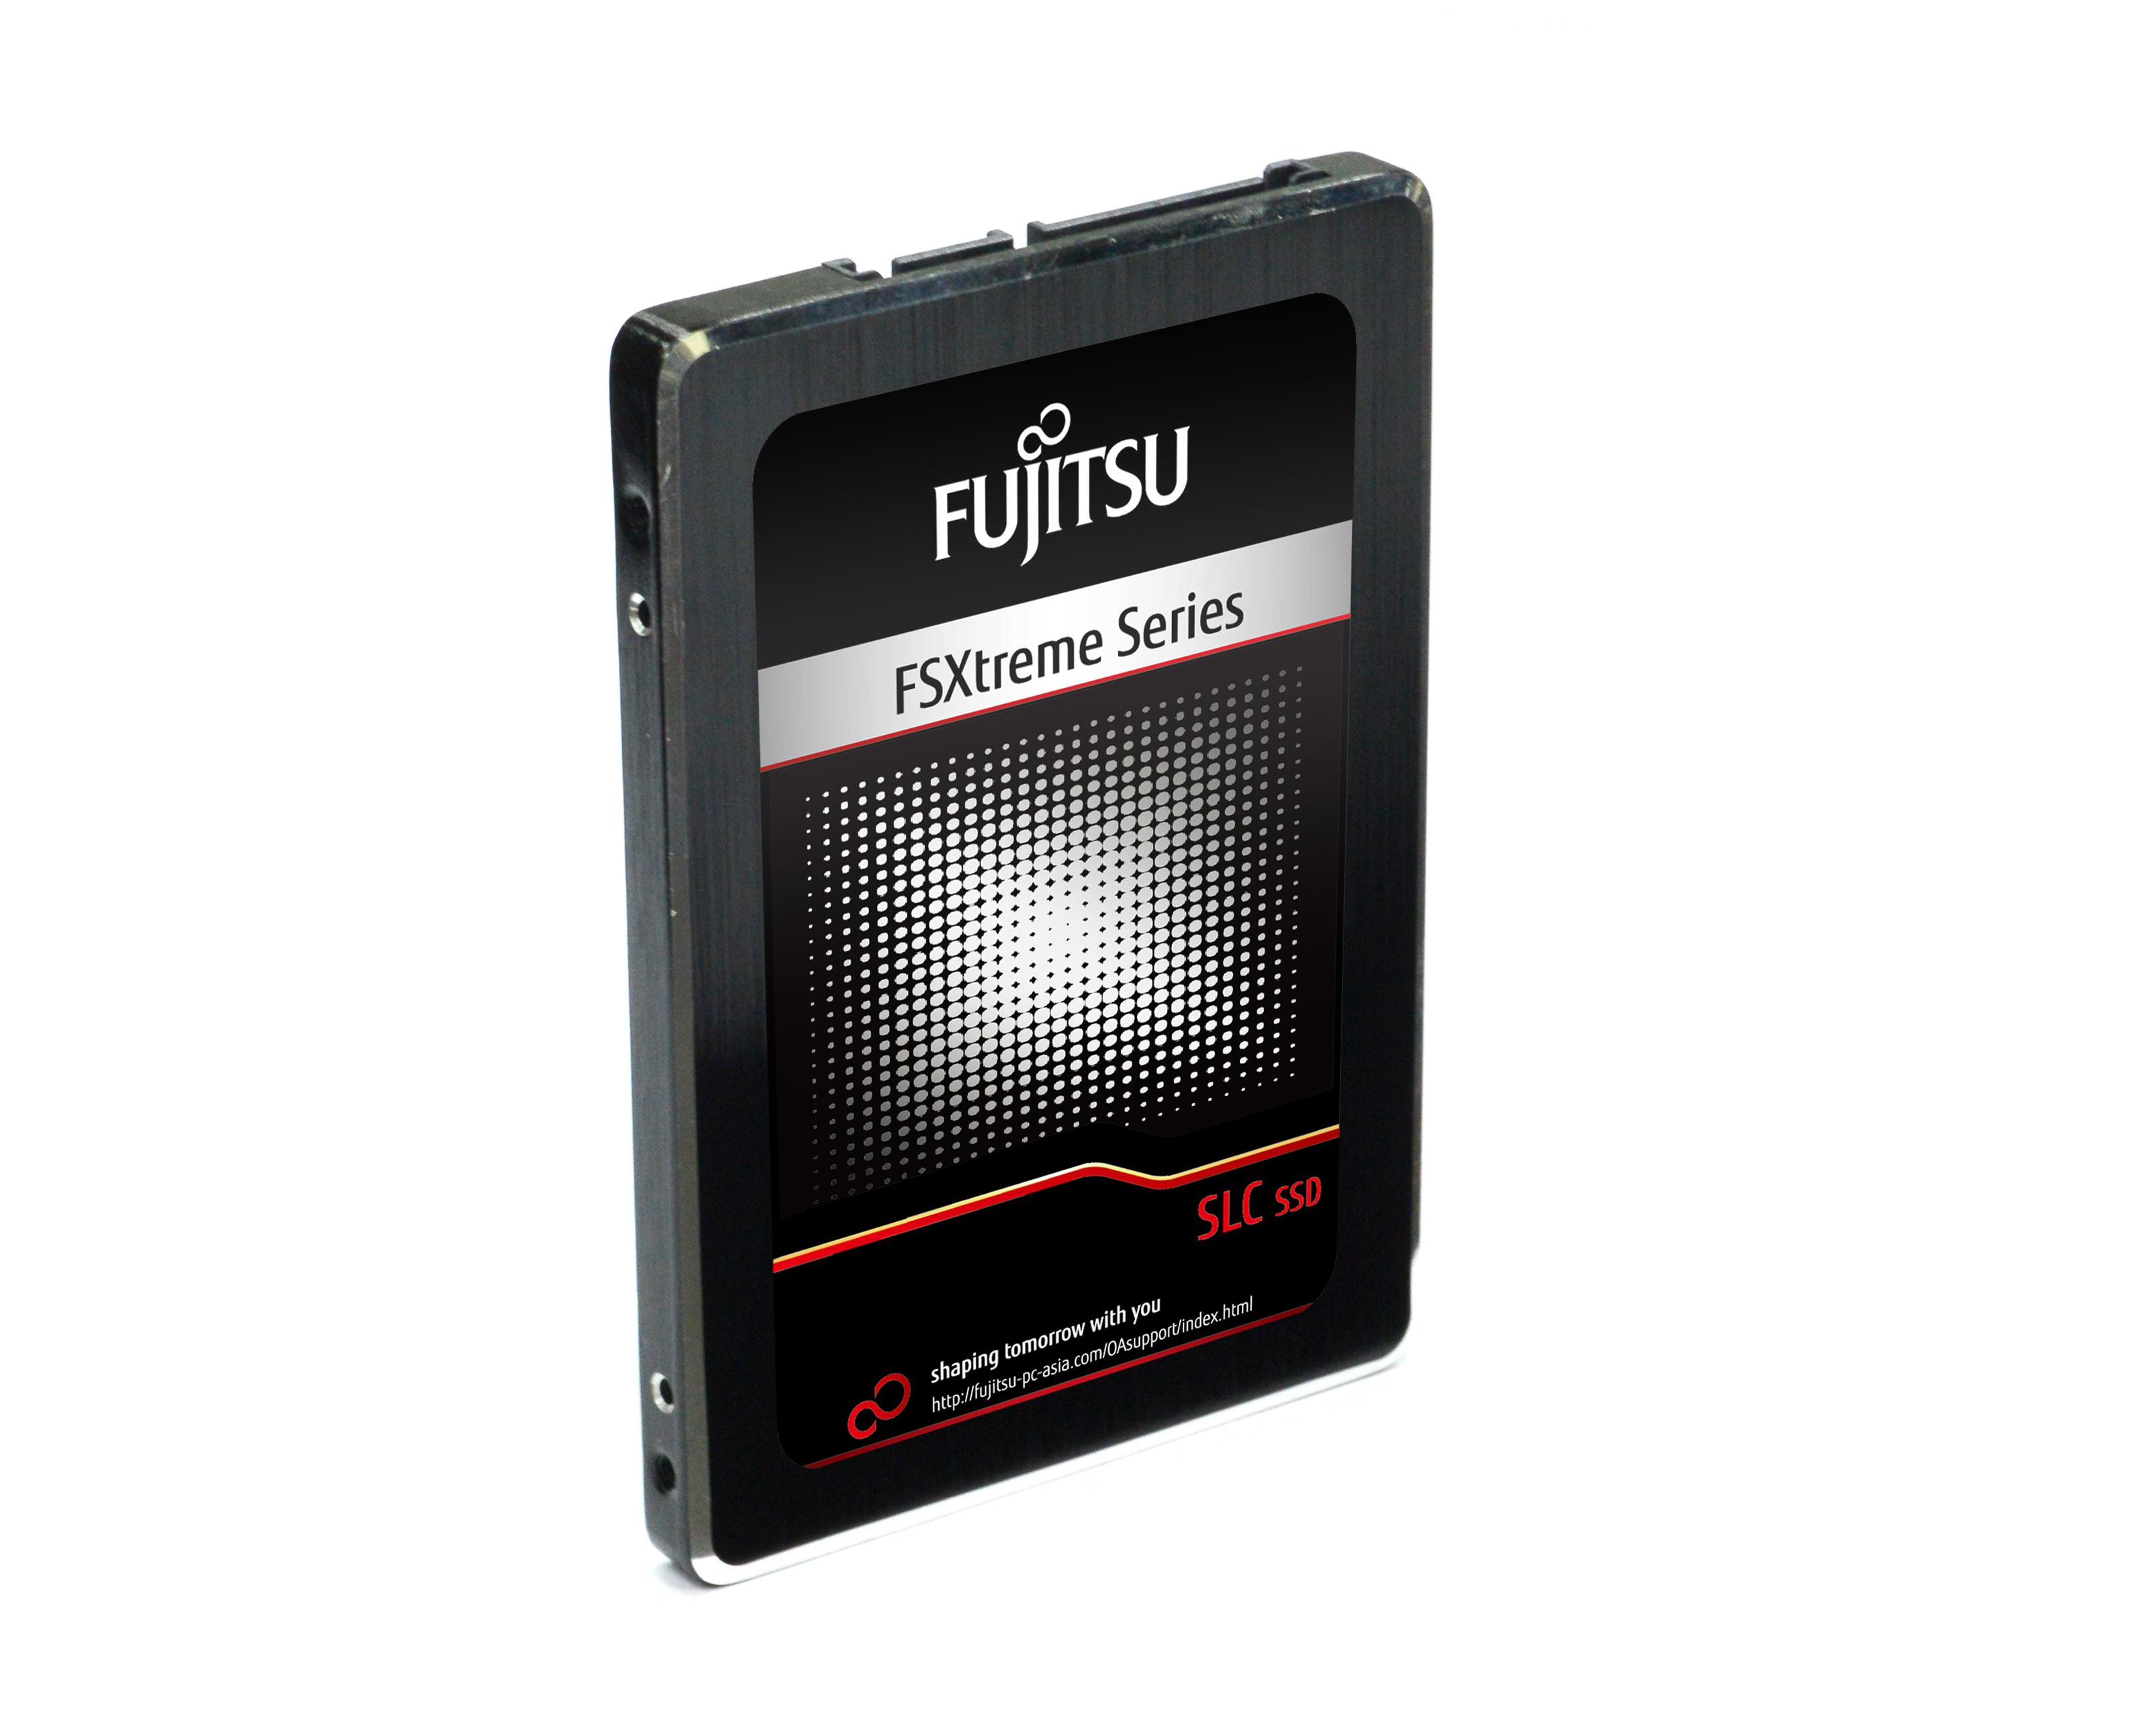 Fujitsu FSX 固態硬碟-第一家推出採用SLC的消費級固態硬碟